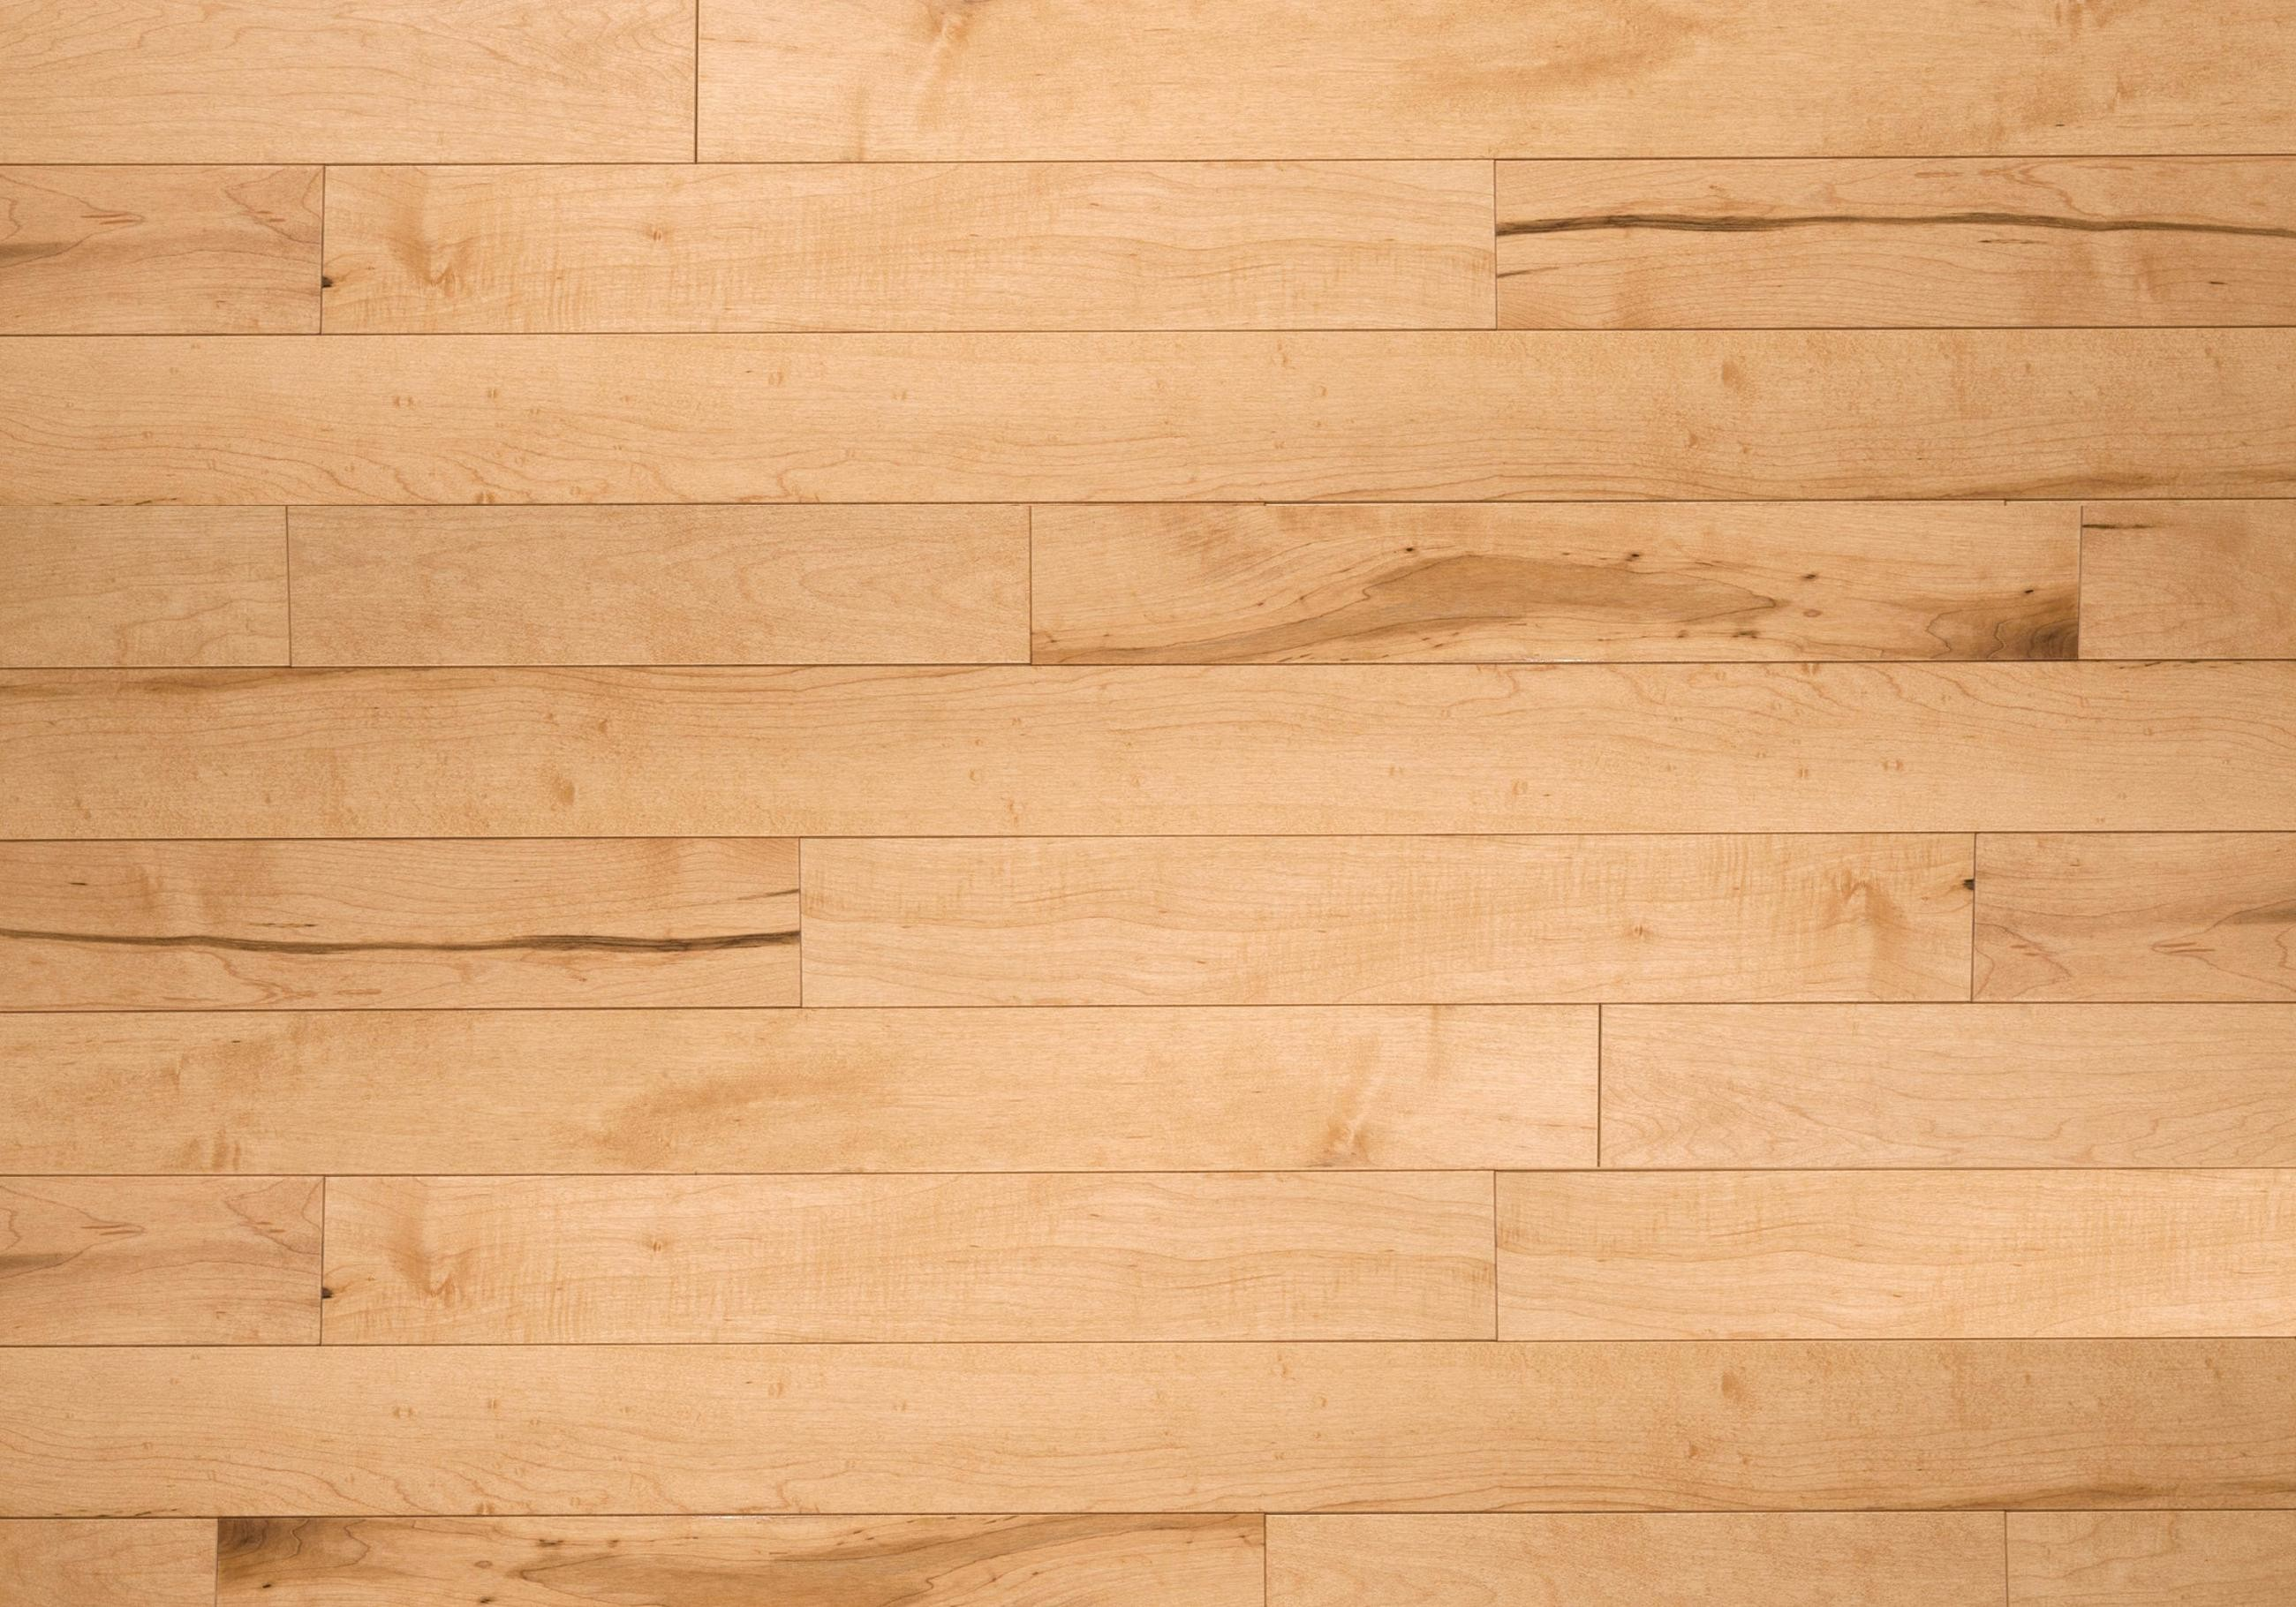 212356 popular light wood background 2600x1820